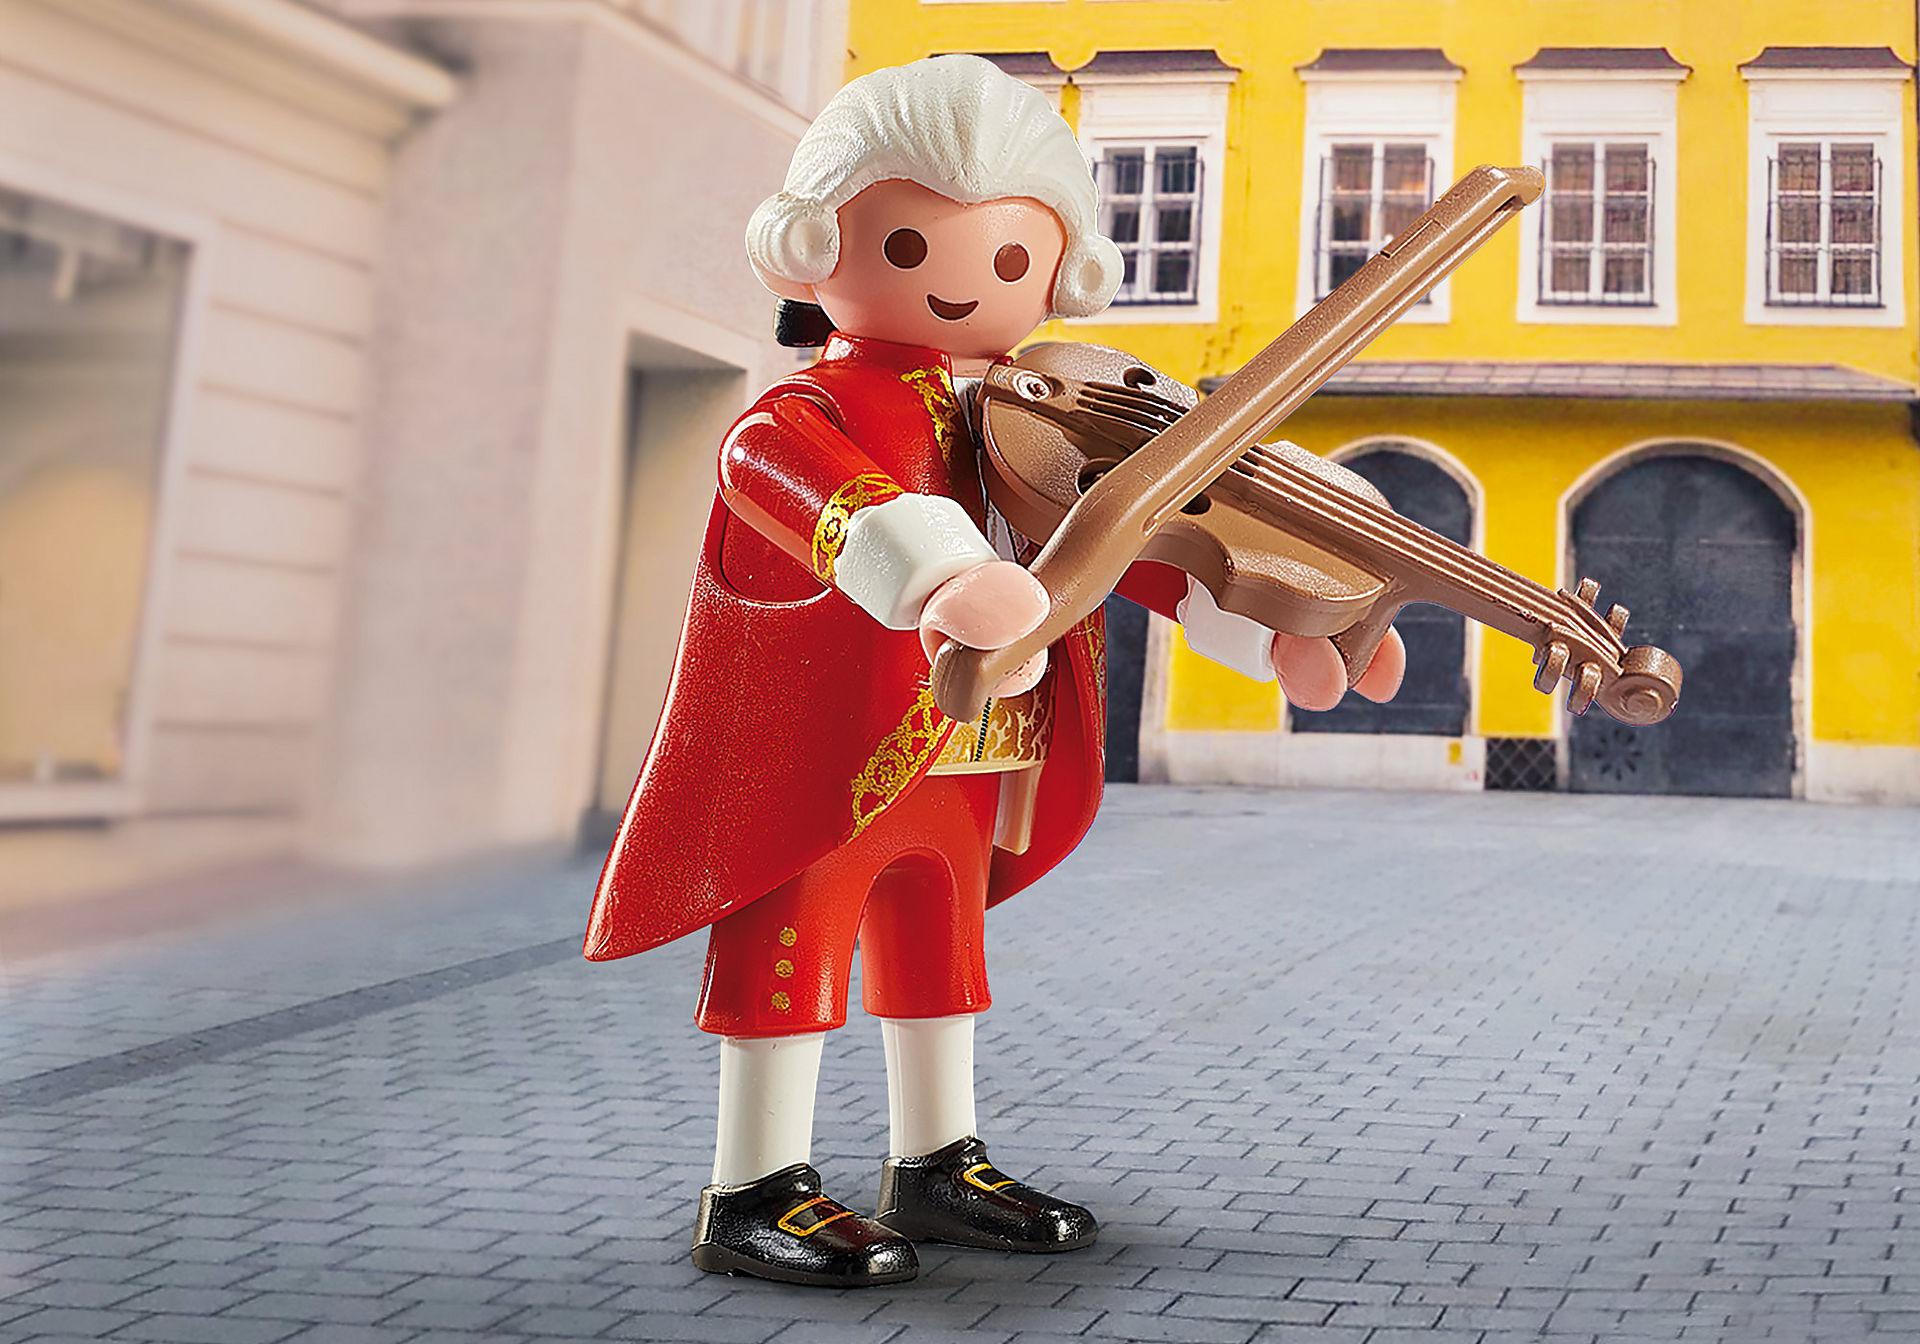 70374 Wolfgang Amadeus Mozart zoom image1